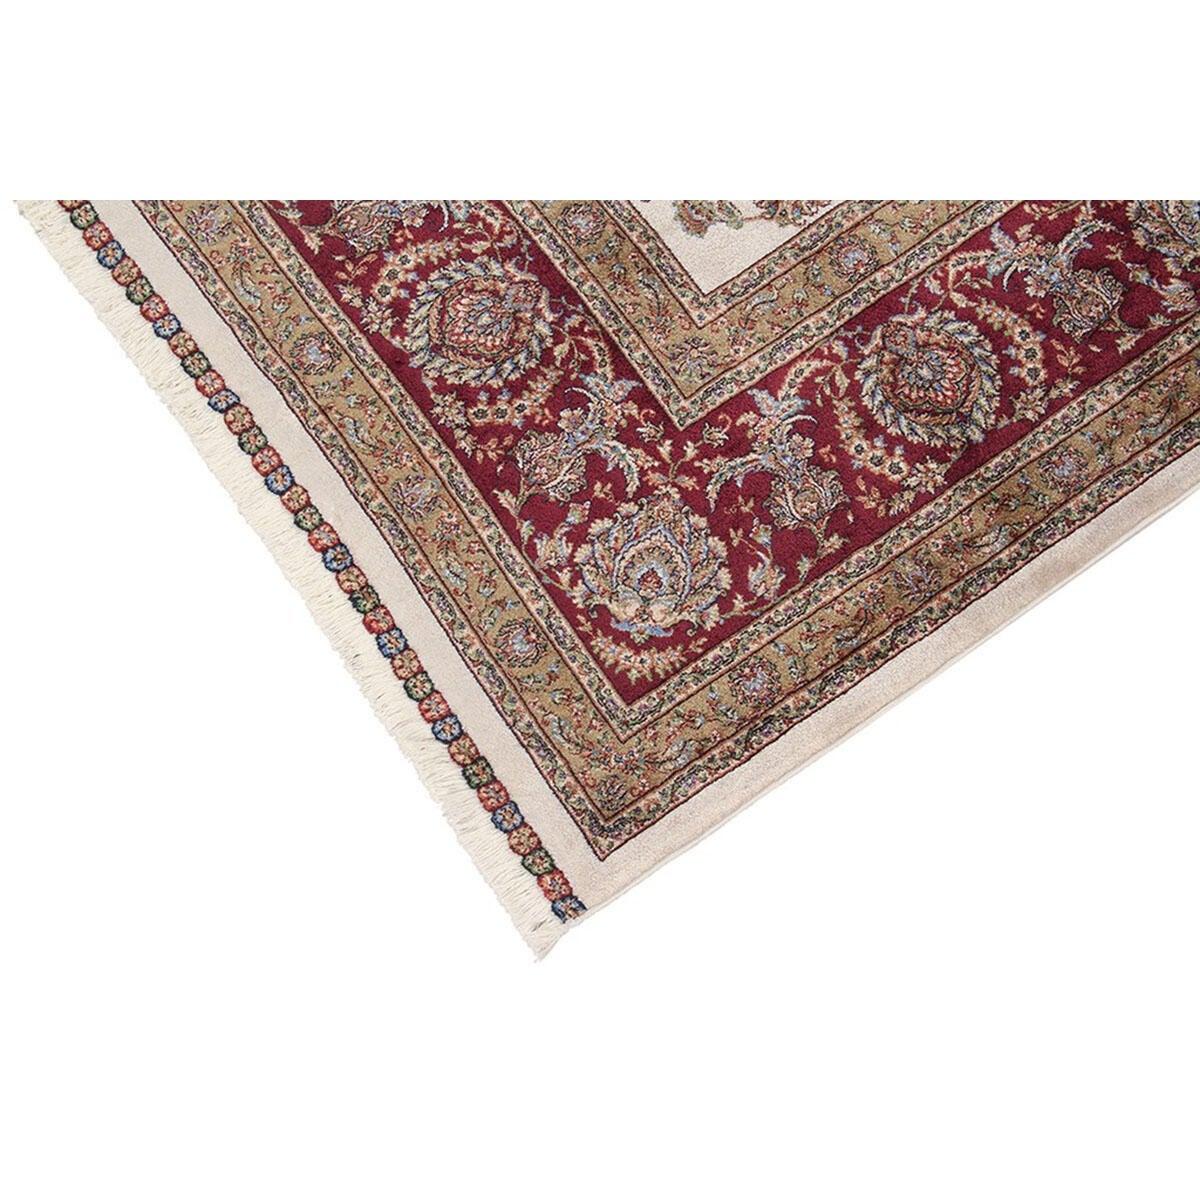 Tappeto Qoum Shah 2 in cotone, beige, 200x300 - 3